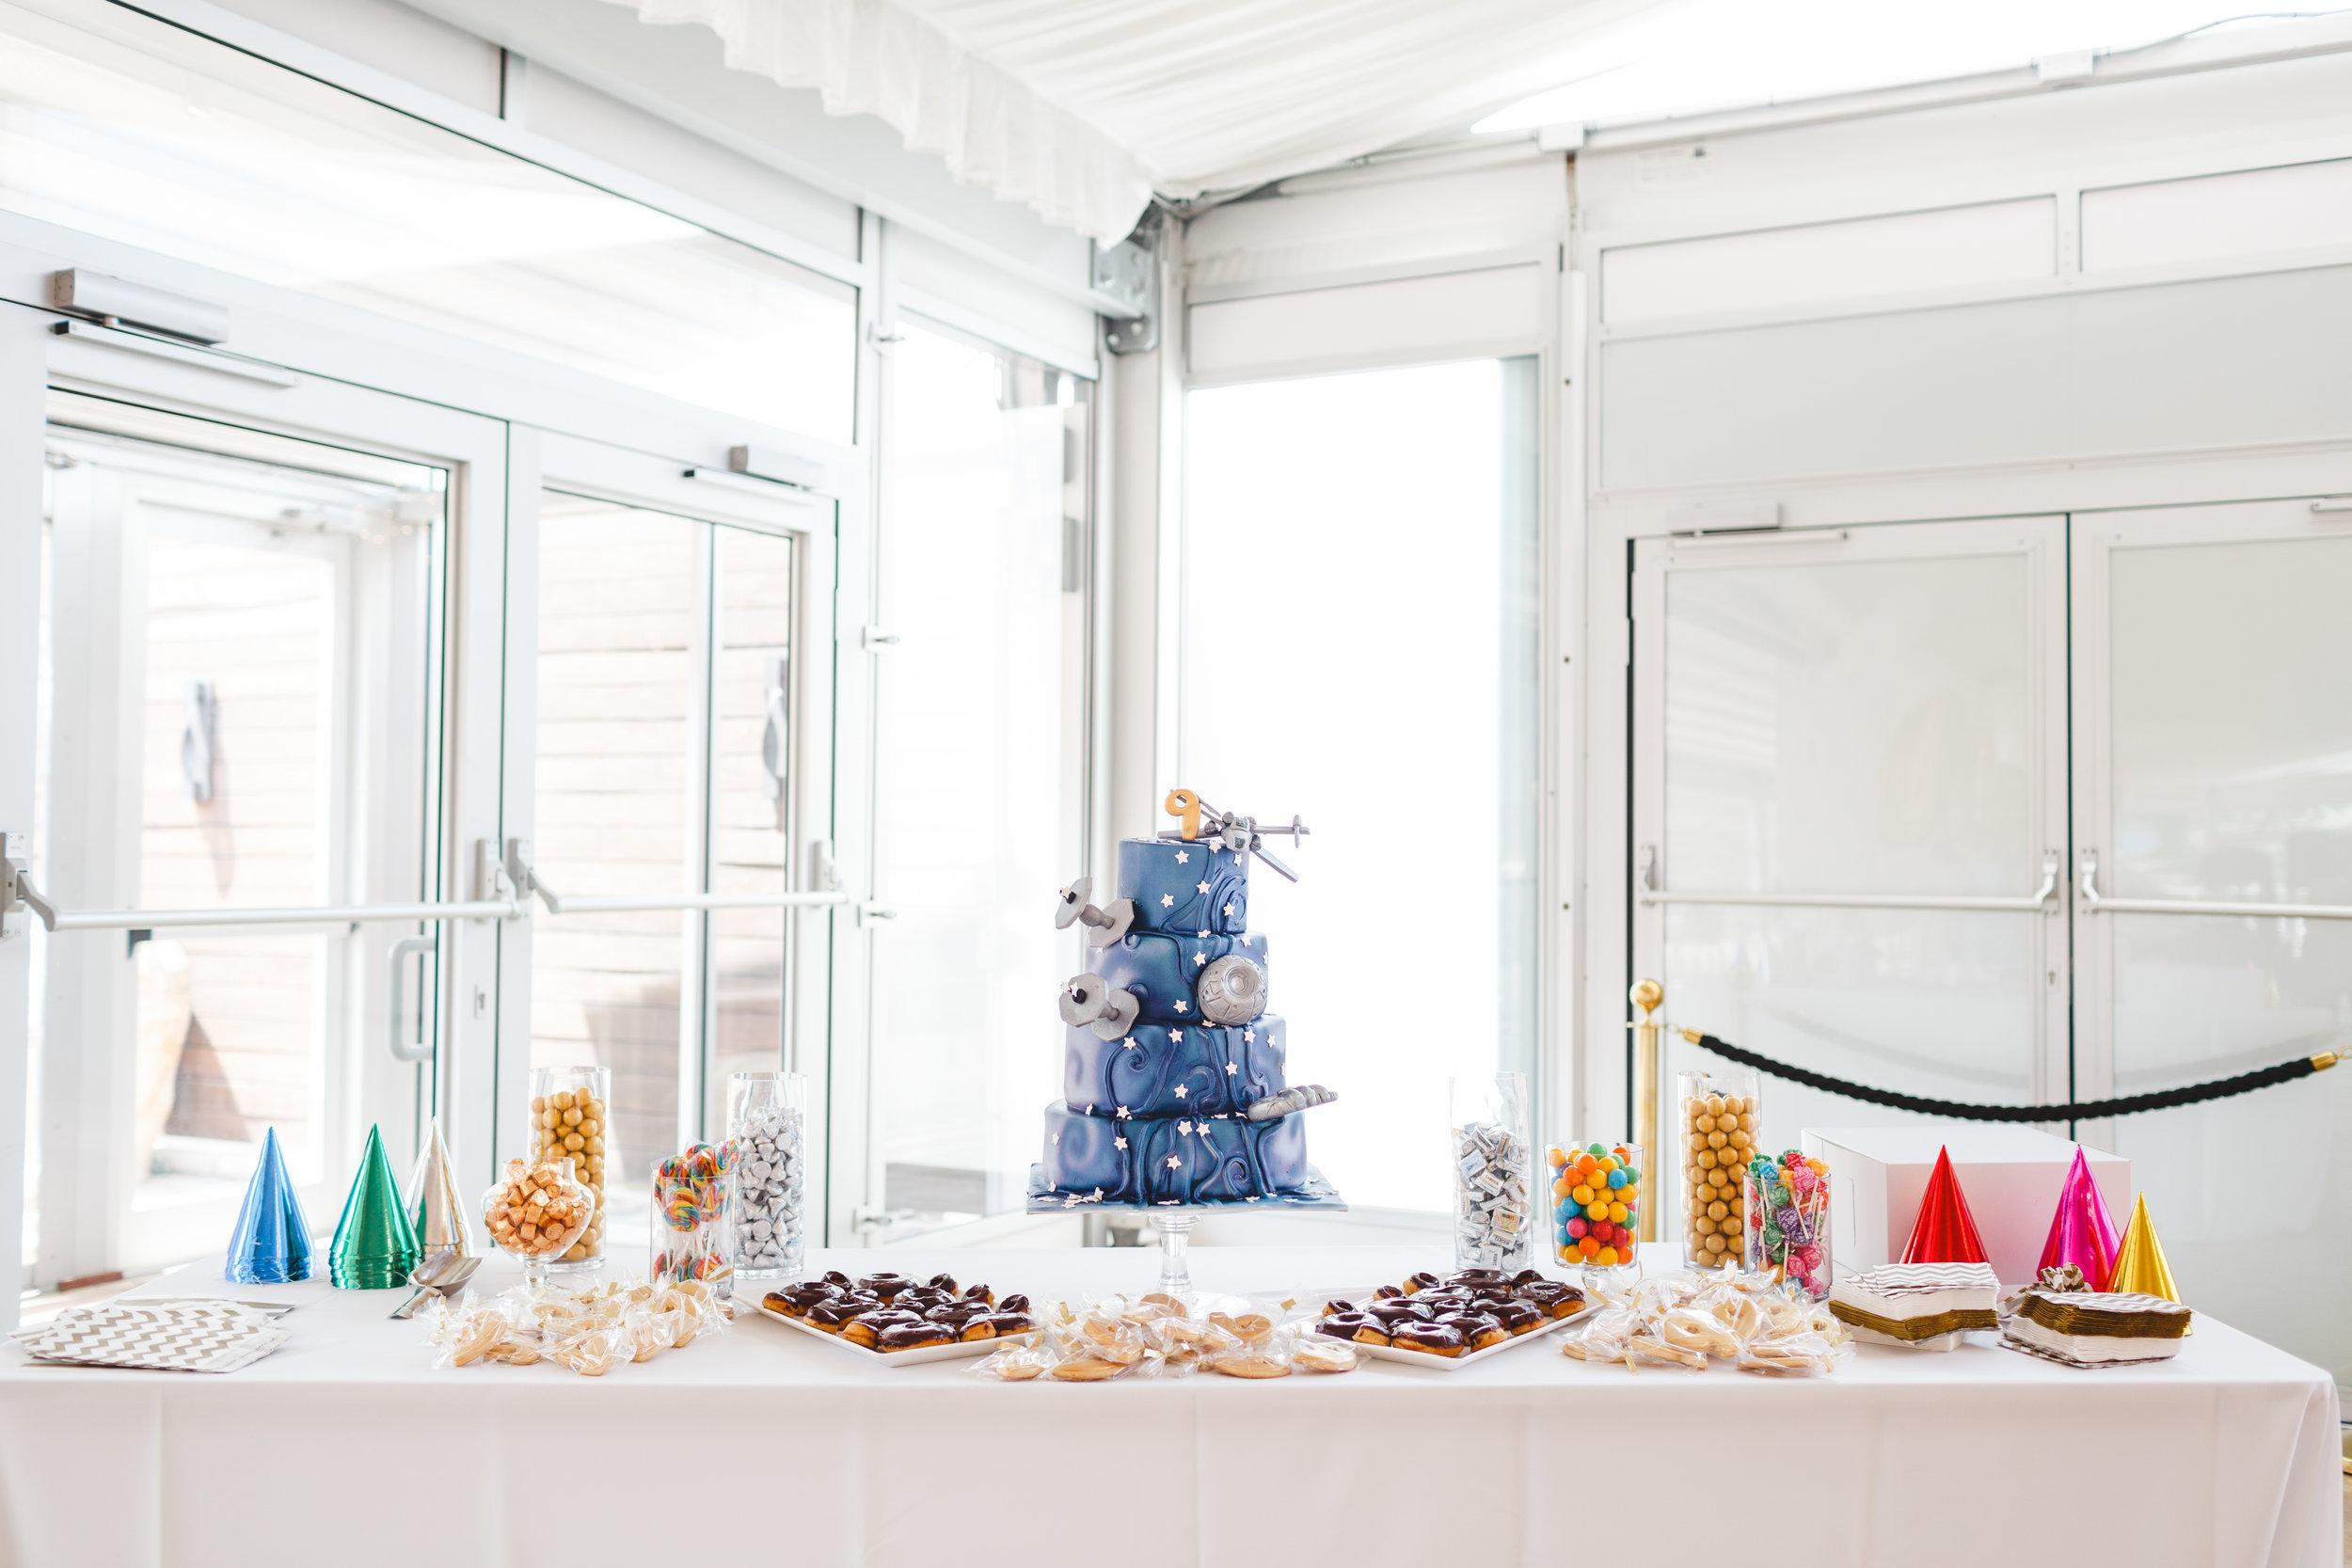 star wars birthday treats, boy birthday, star wars party decor, Wrap It Up Parties